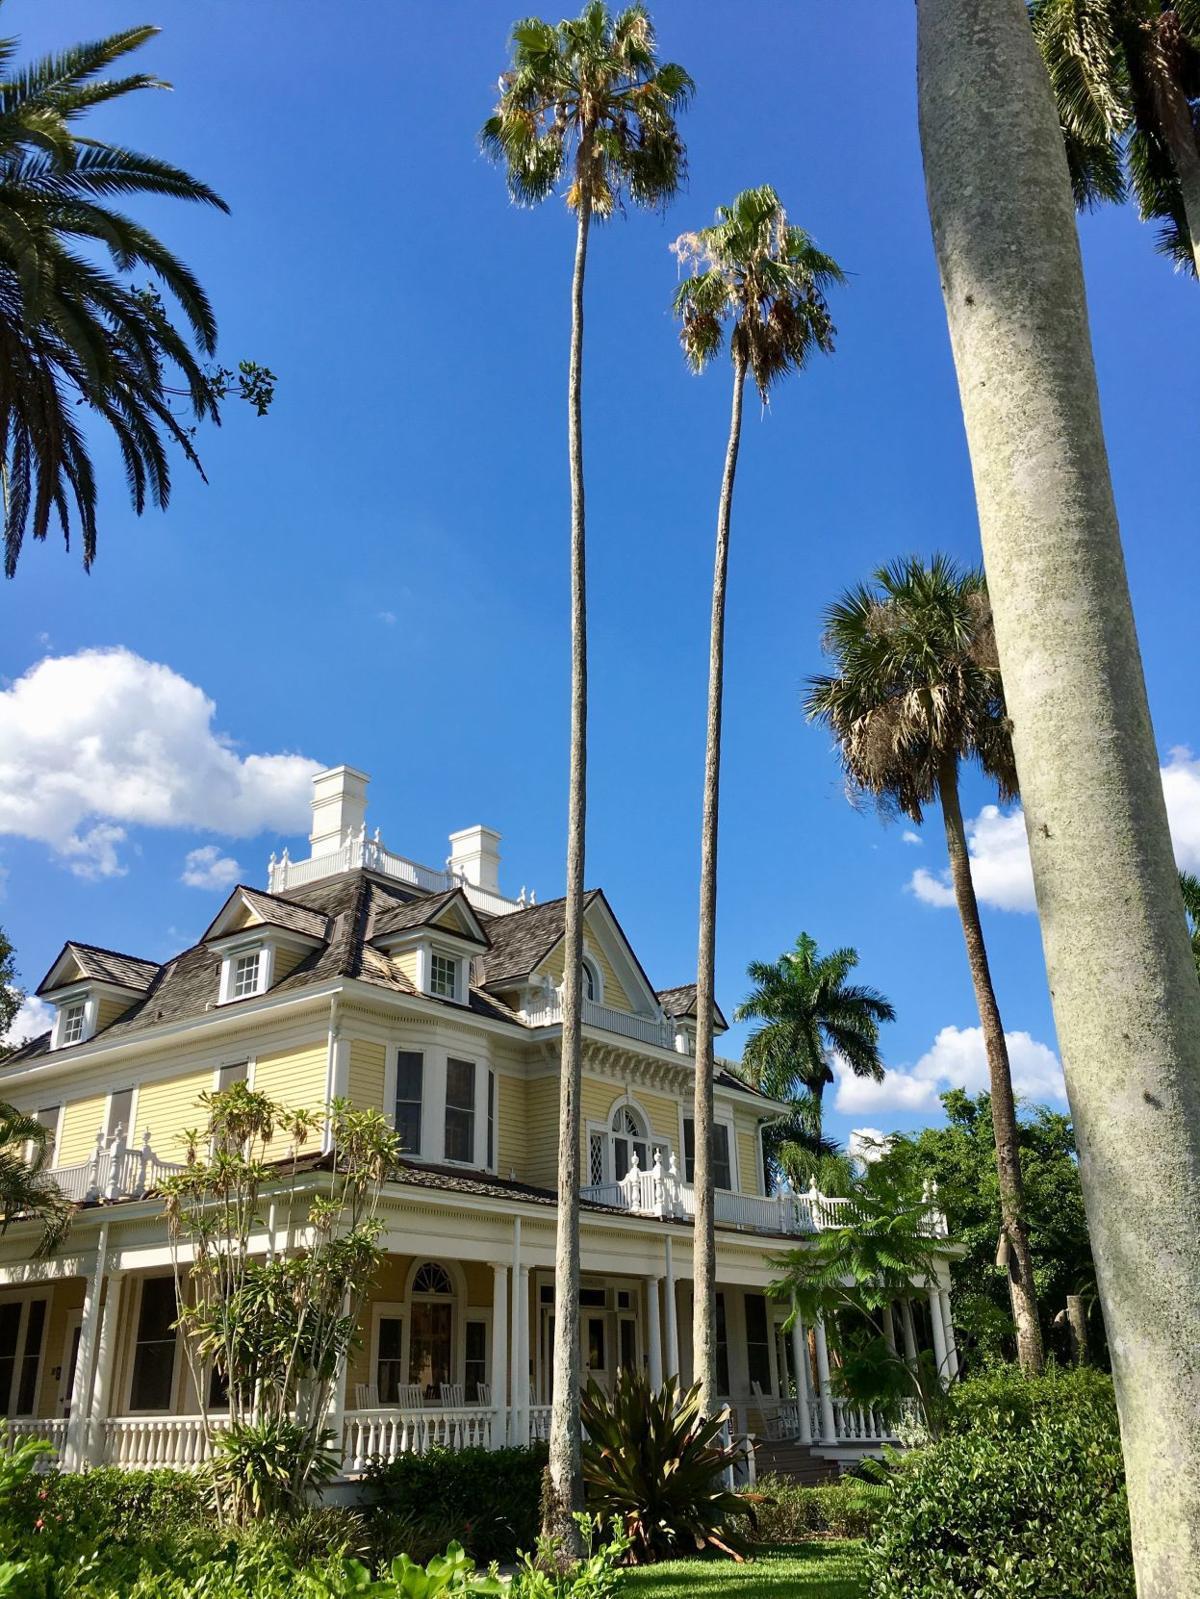 Burroughs Home&Garden.jpg